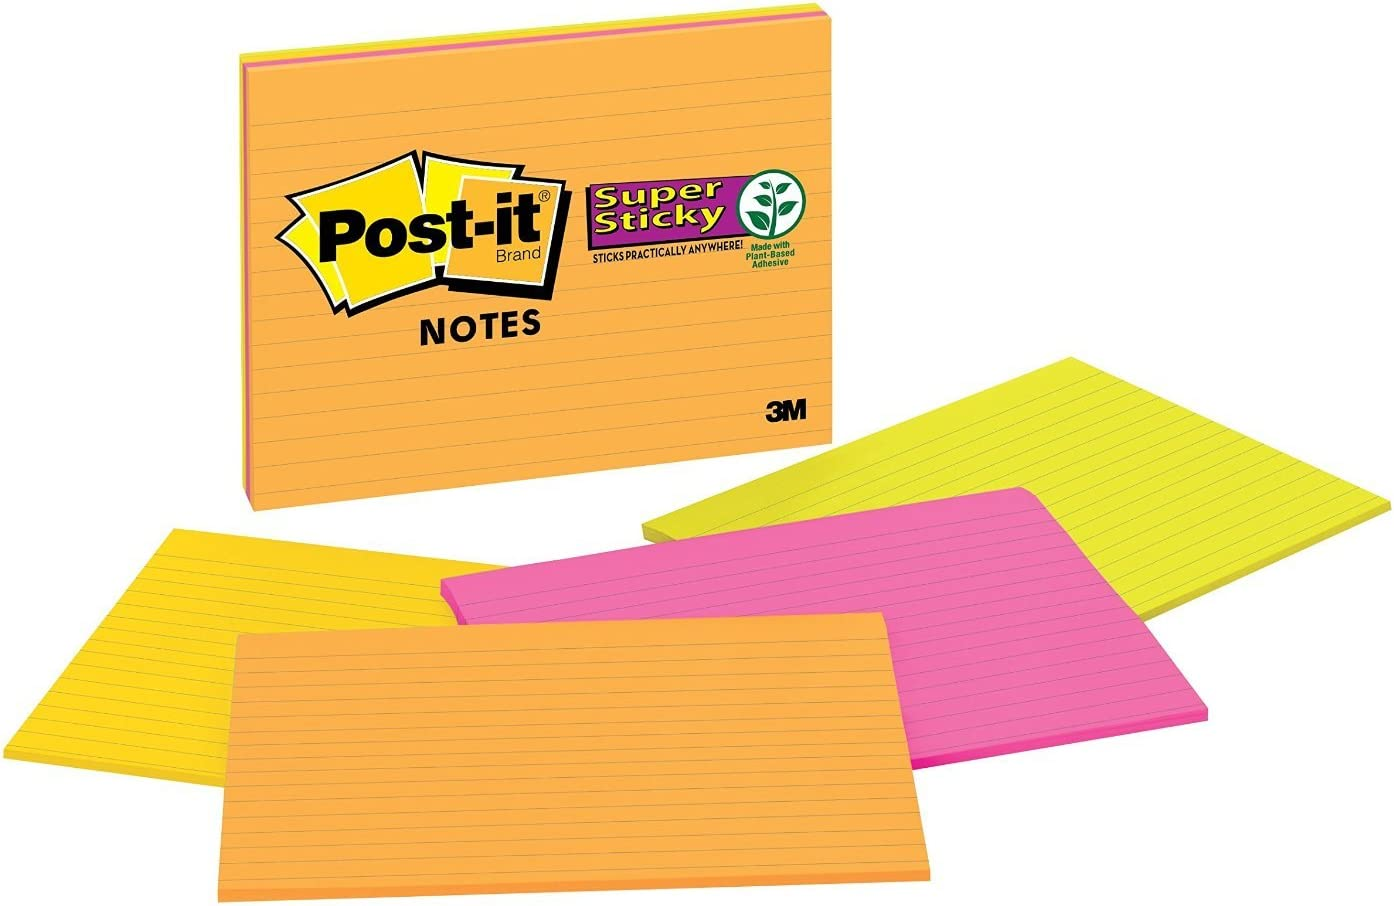 MMM6845SSPL - Post-it Super Sticky Format Fashion Large Branded goods Notes